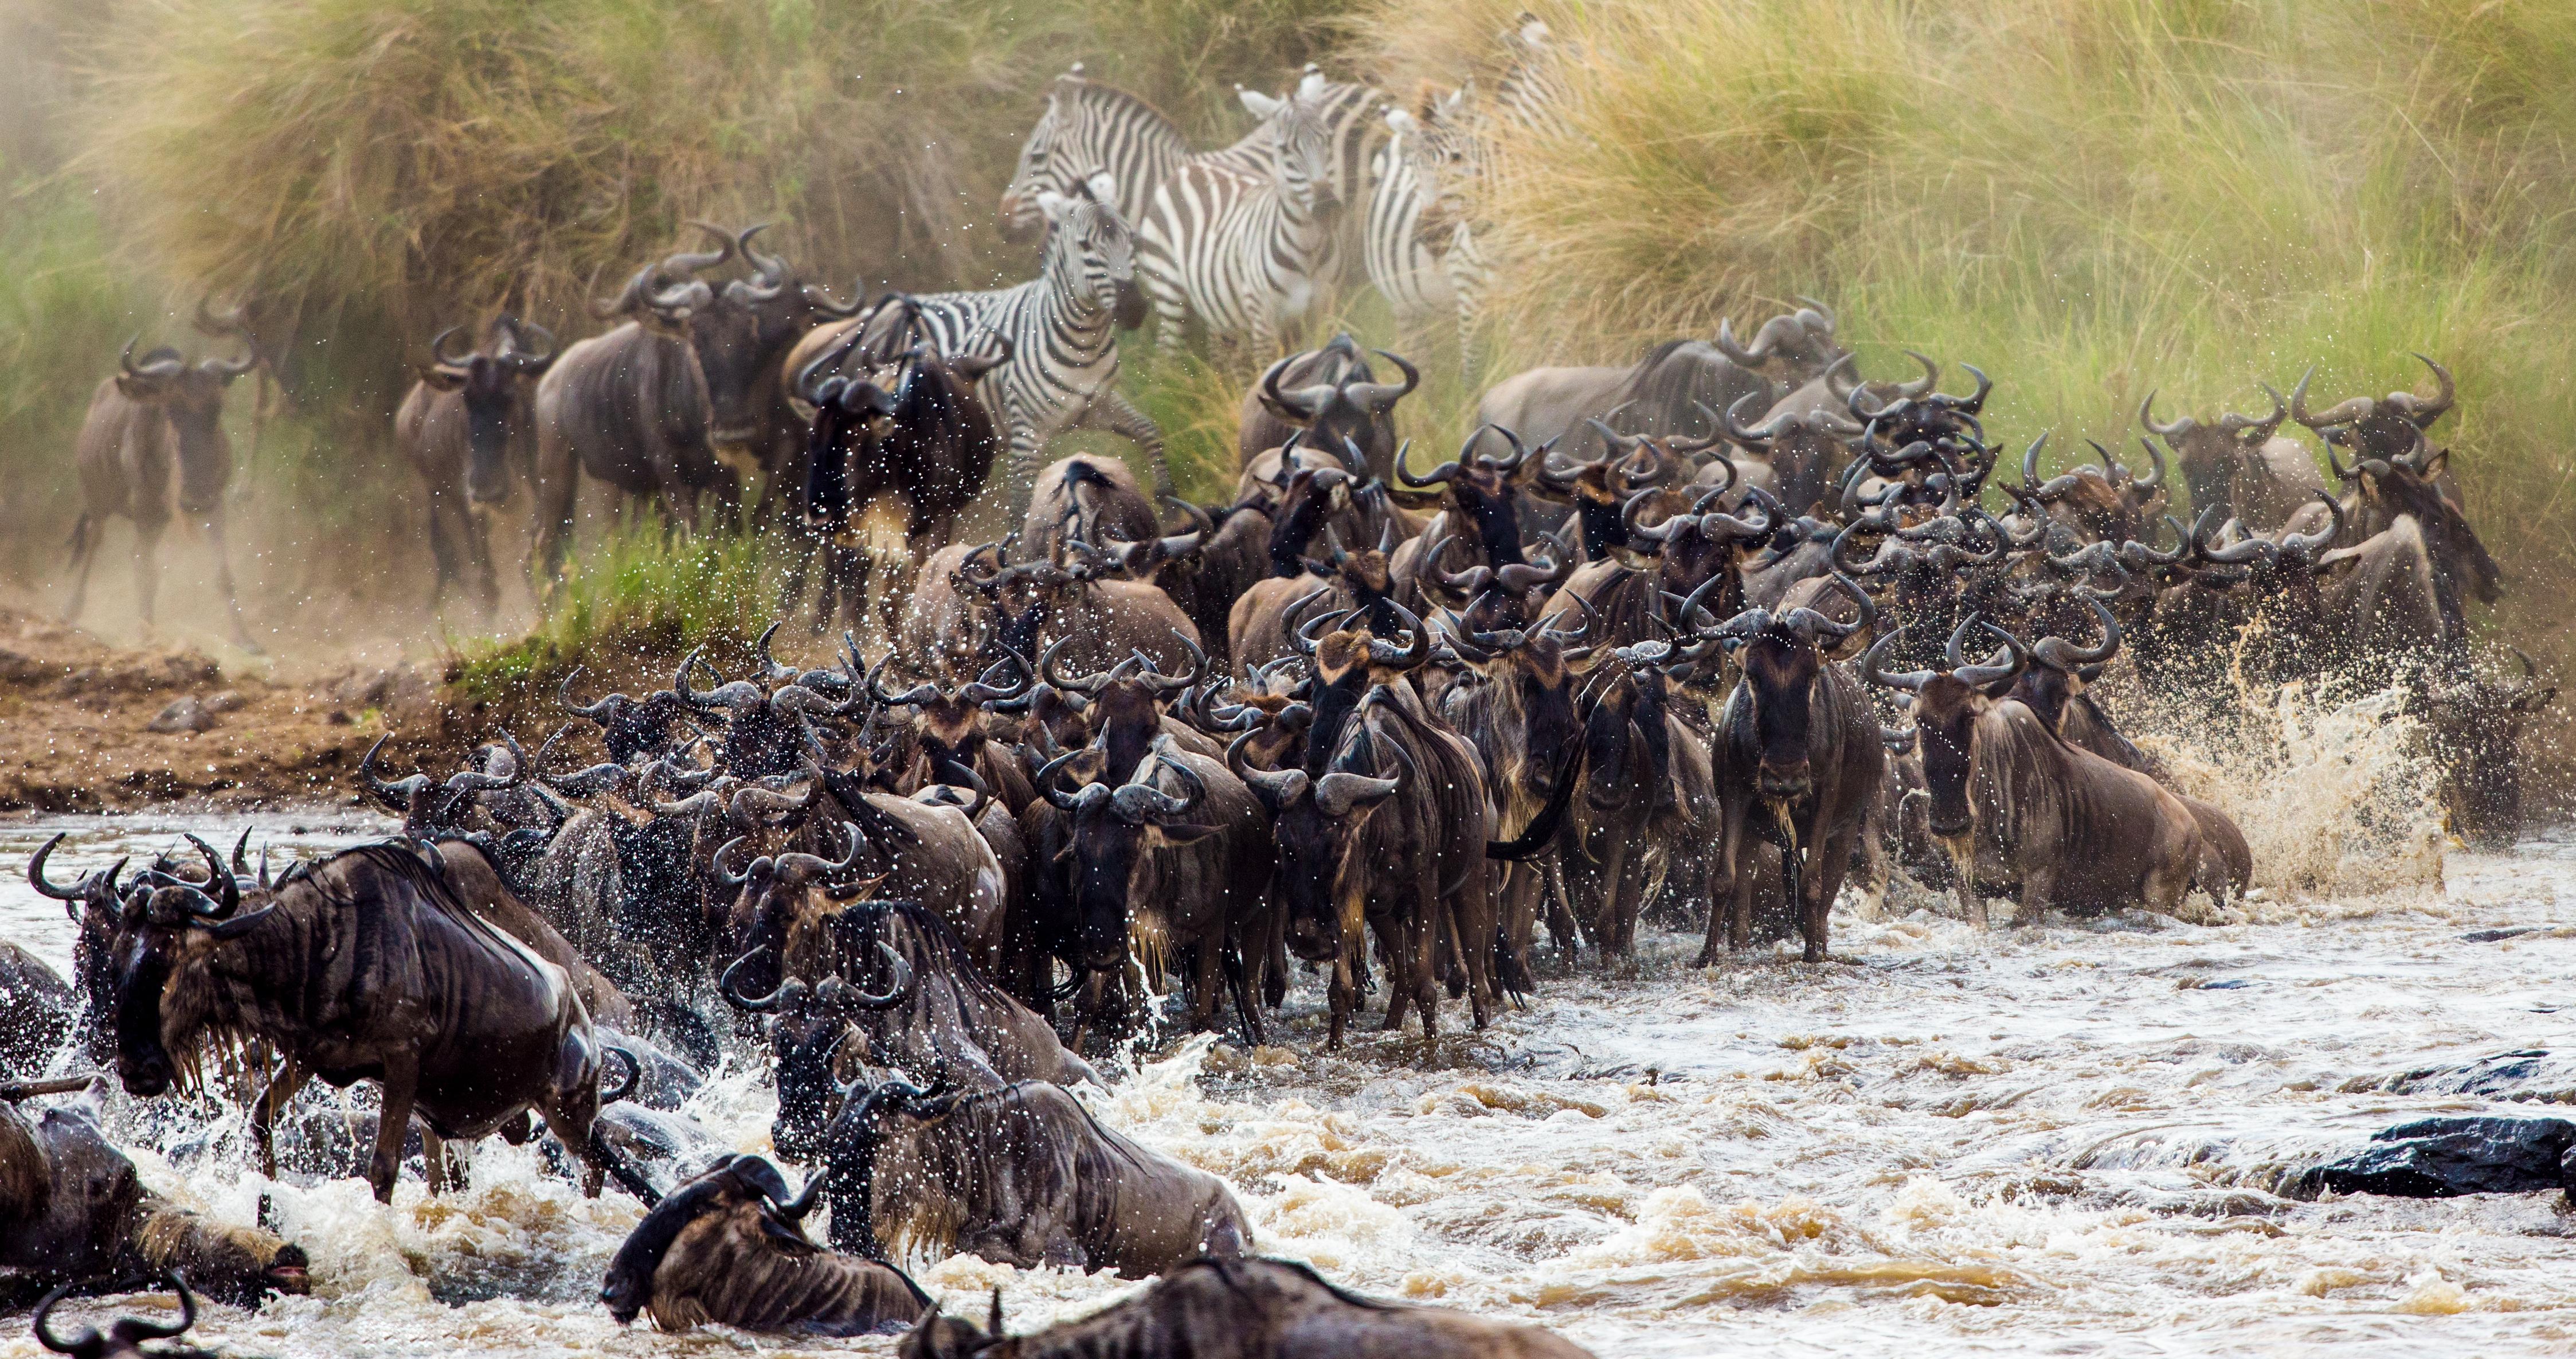 The wildebeest Mara river crossing